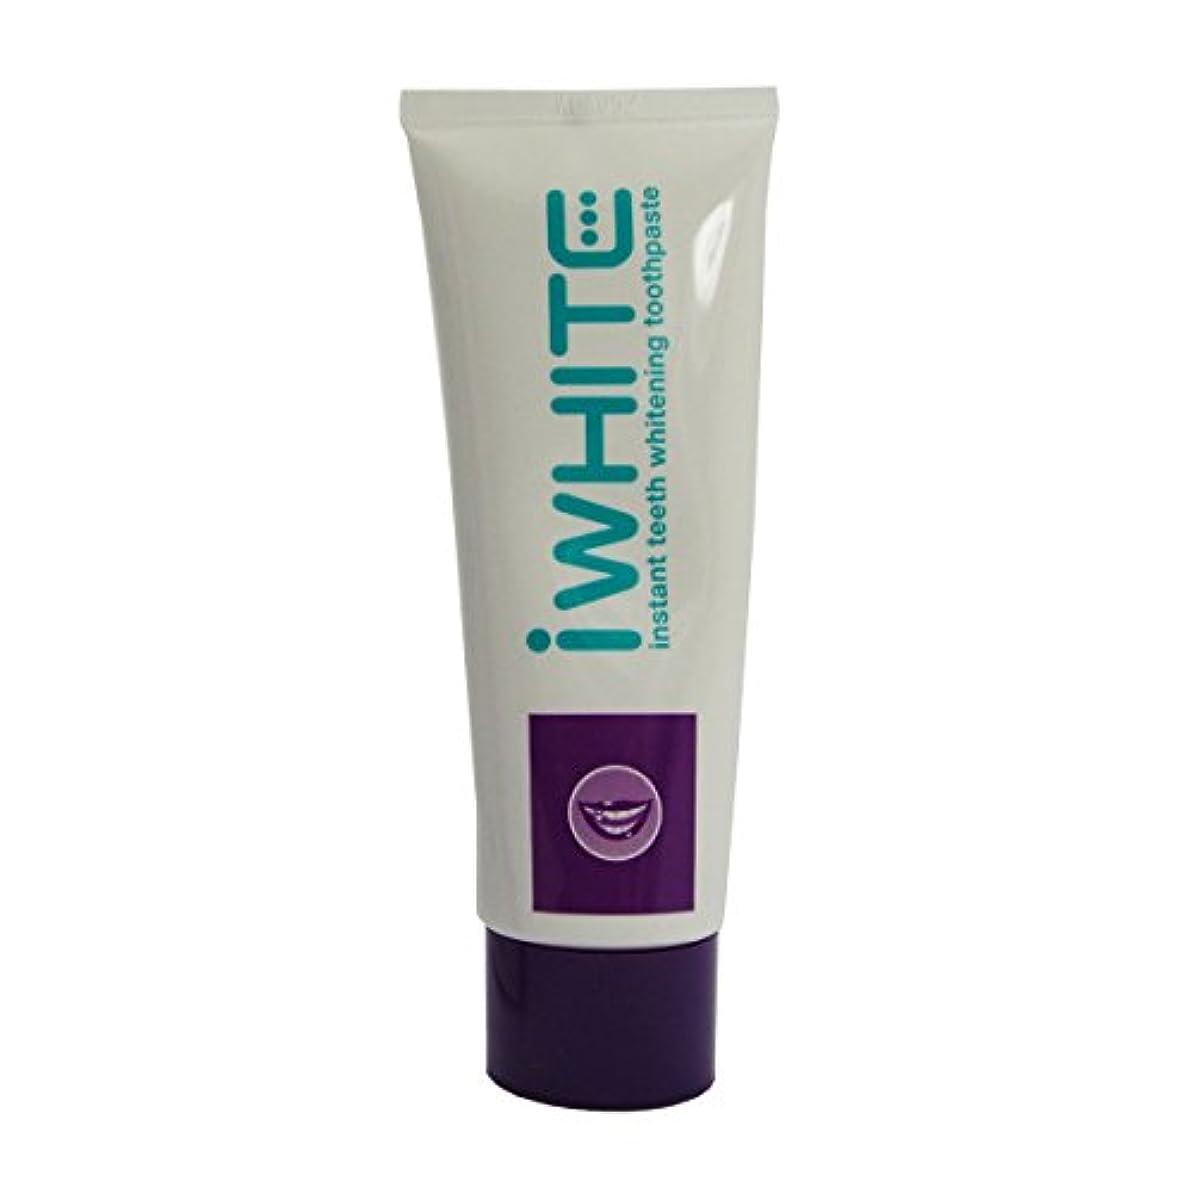 受け皿債務者自発的Iwhite Whitening Toothpaste 75ml [並行輸入品]